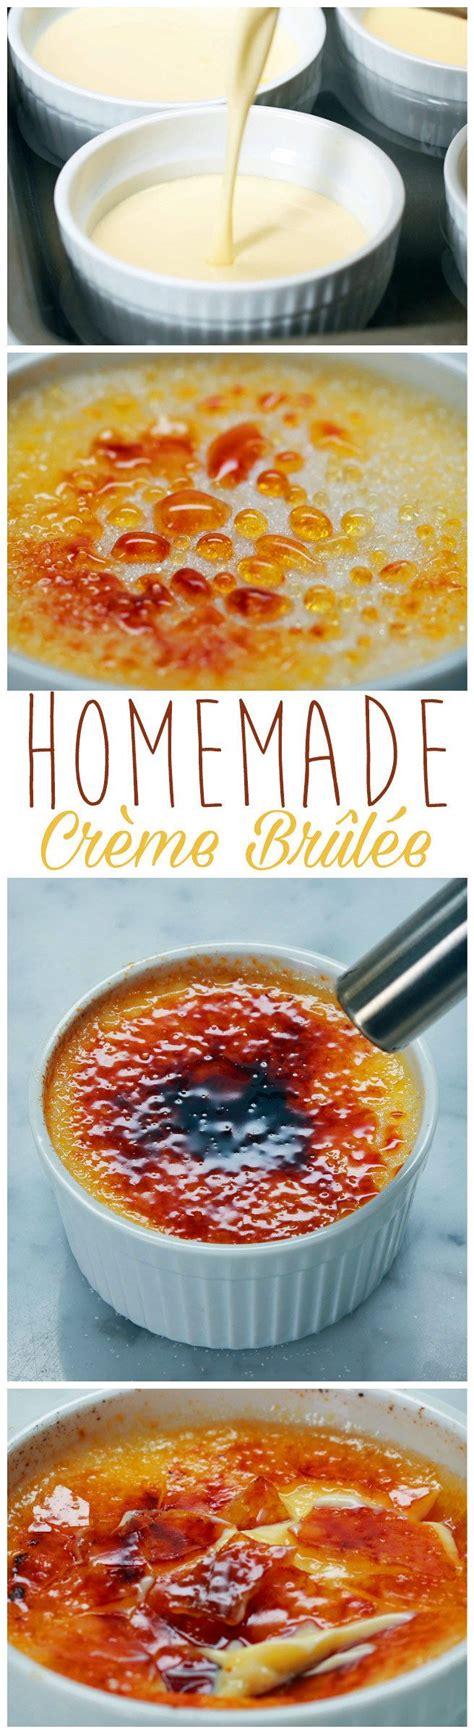 cuisine creme brulee 25 best is c ideas on vodka